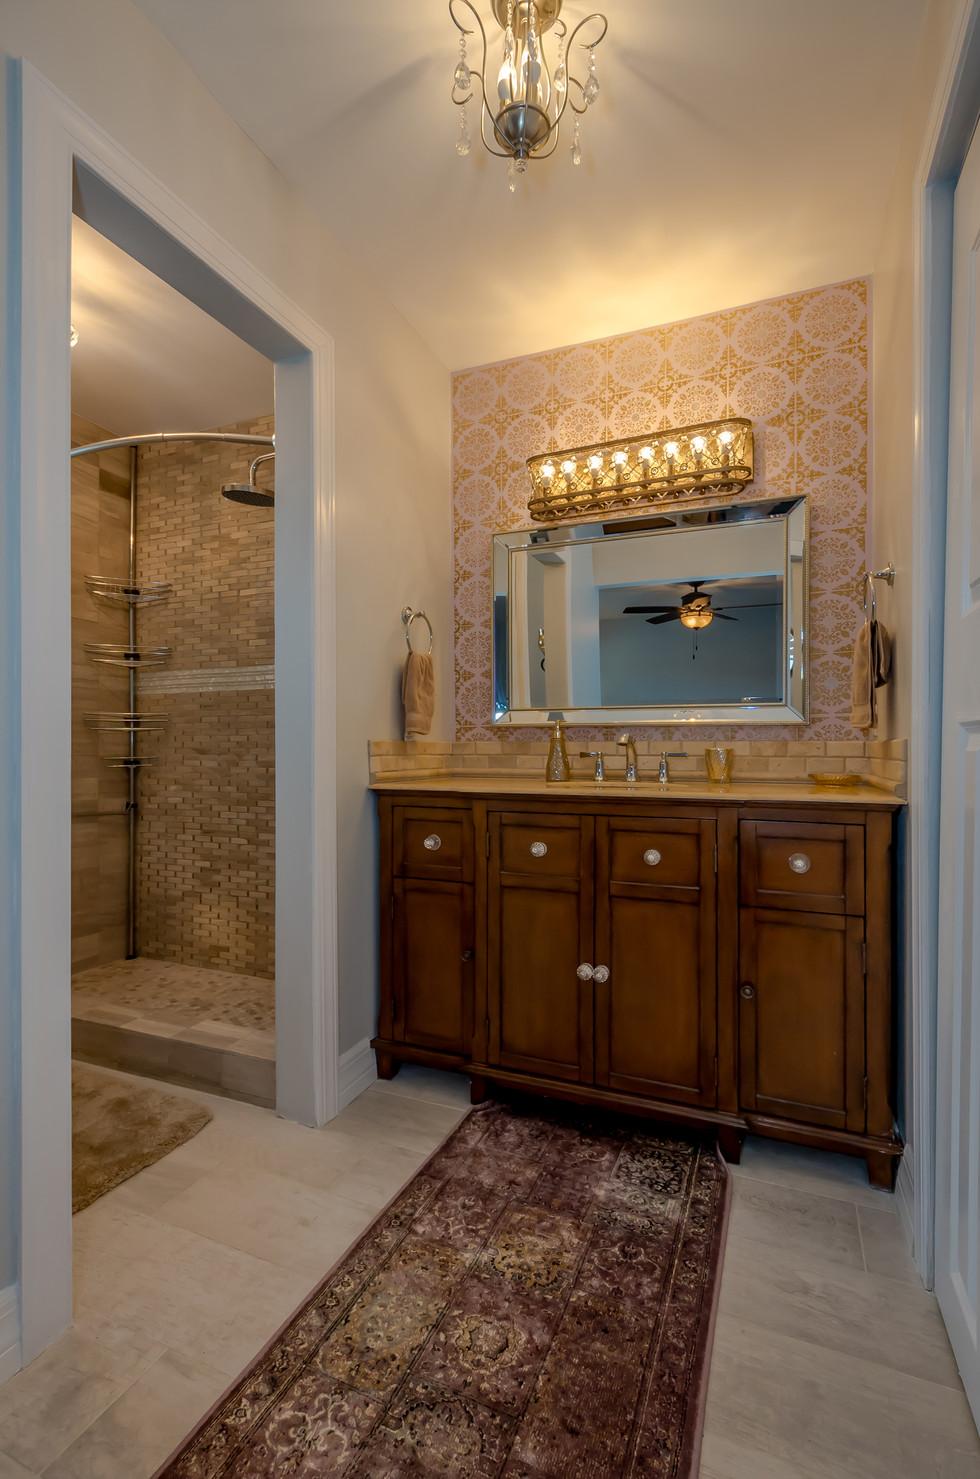 Lovely Master Bathroom Vanity Remodel Highlighted by Unique Wallpaper & Elegant Lighting